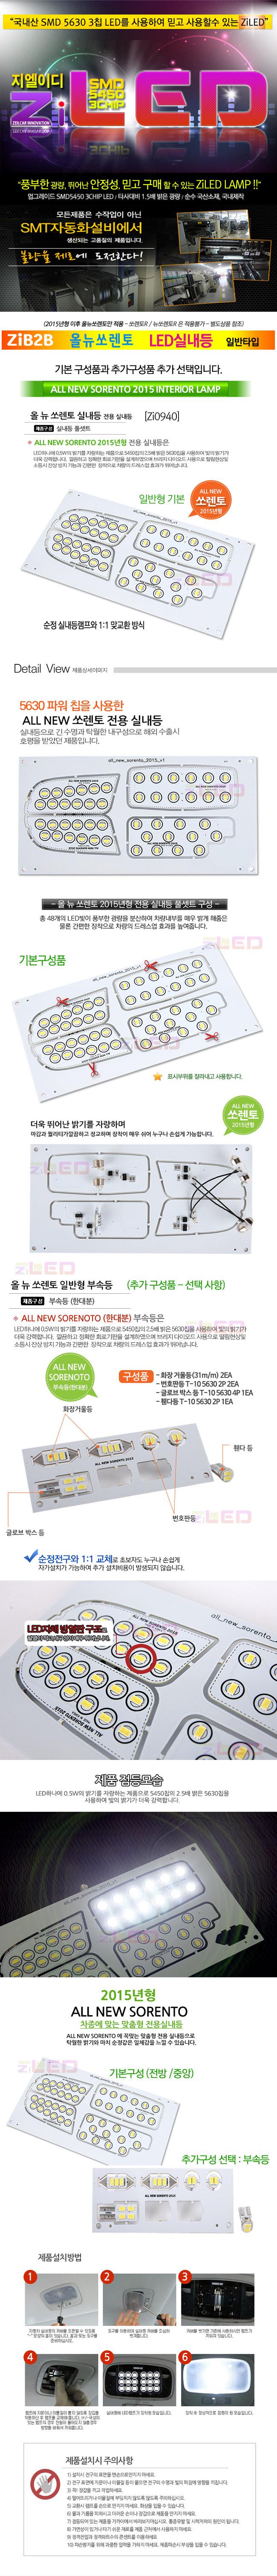 [ZiLED] LED 실내등 3칩 세트- 2015년형 올뉴쏘렌토(일반형) [Zi0940]